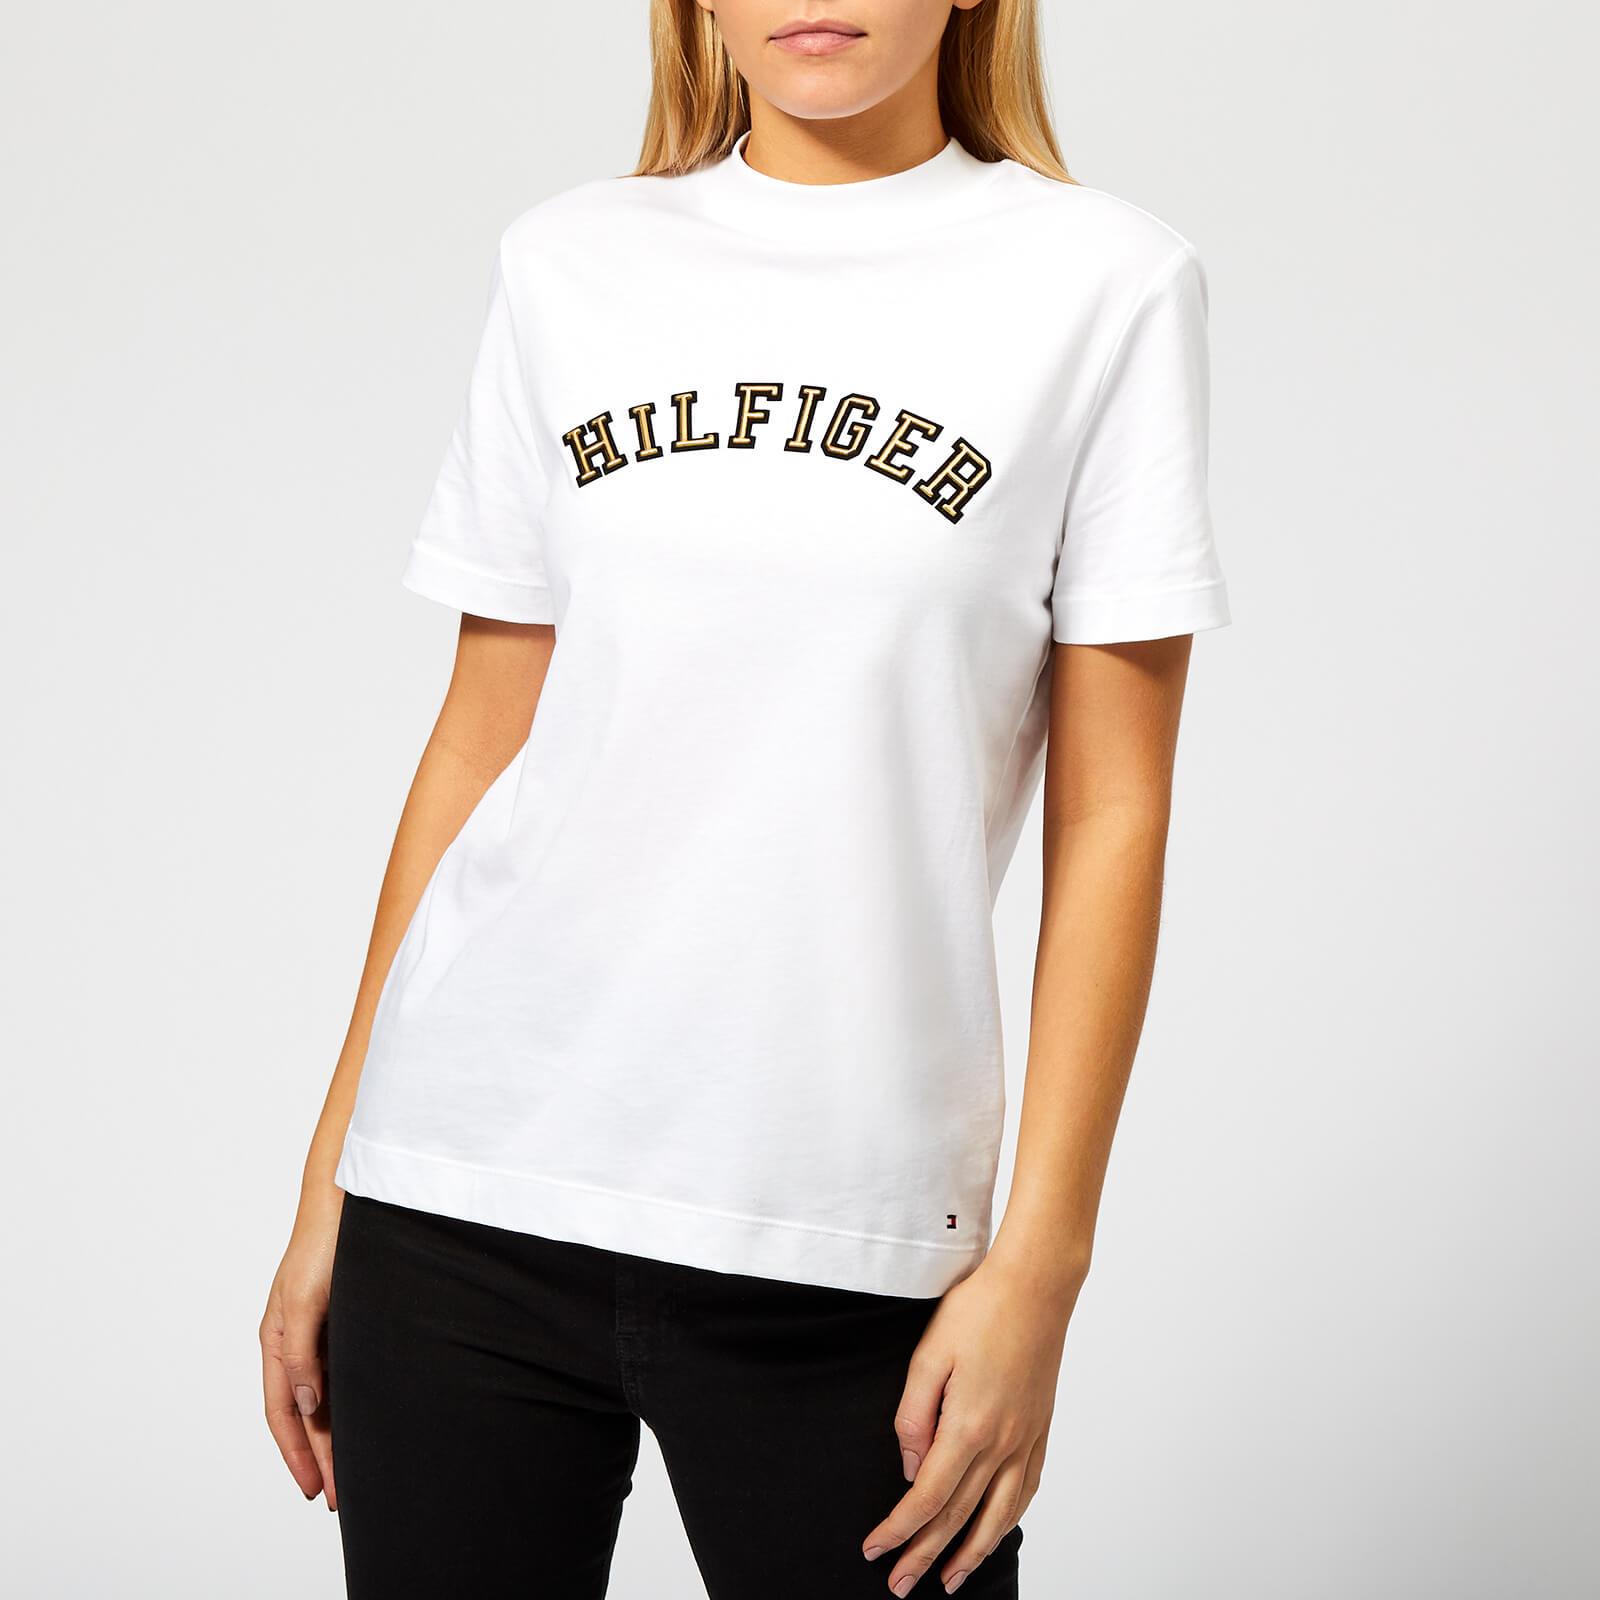 e6e4b920 Tommy Hilfiger Women's Mimi High Neck T-Shirt - White Womens Clothing |  TheHut.com